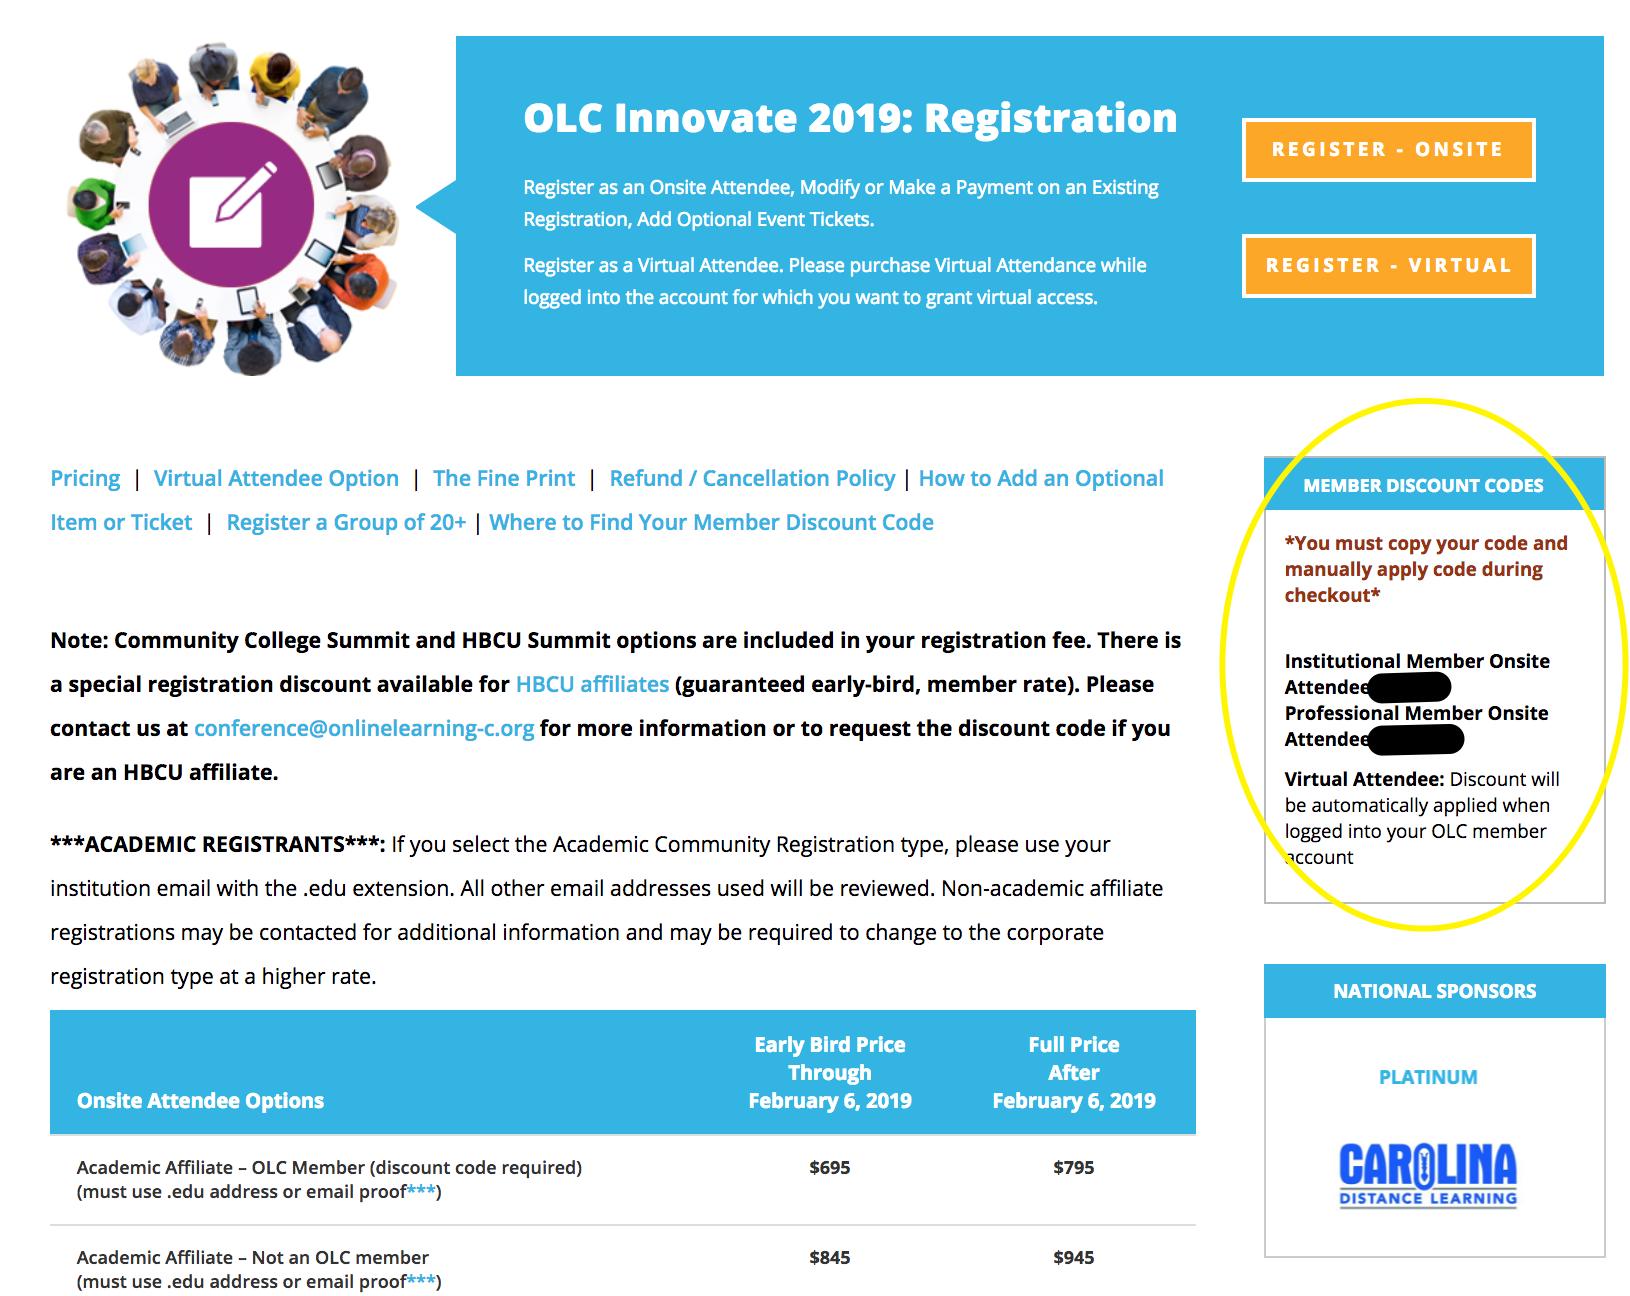 OLCInnovate 2019 - Member Discount Code Location